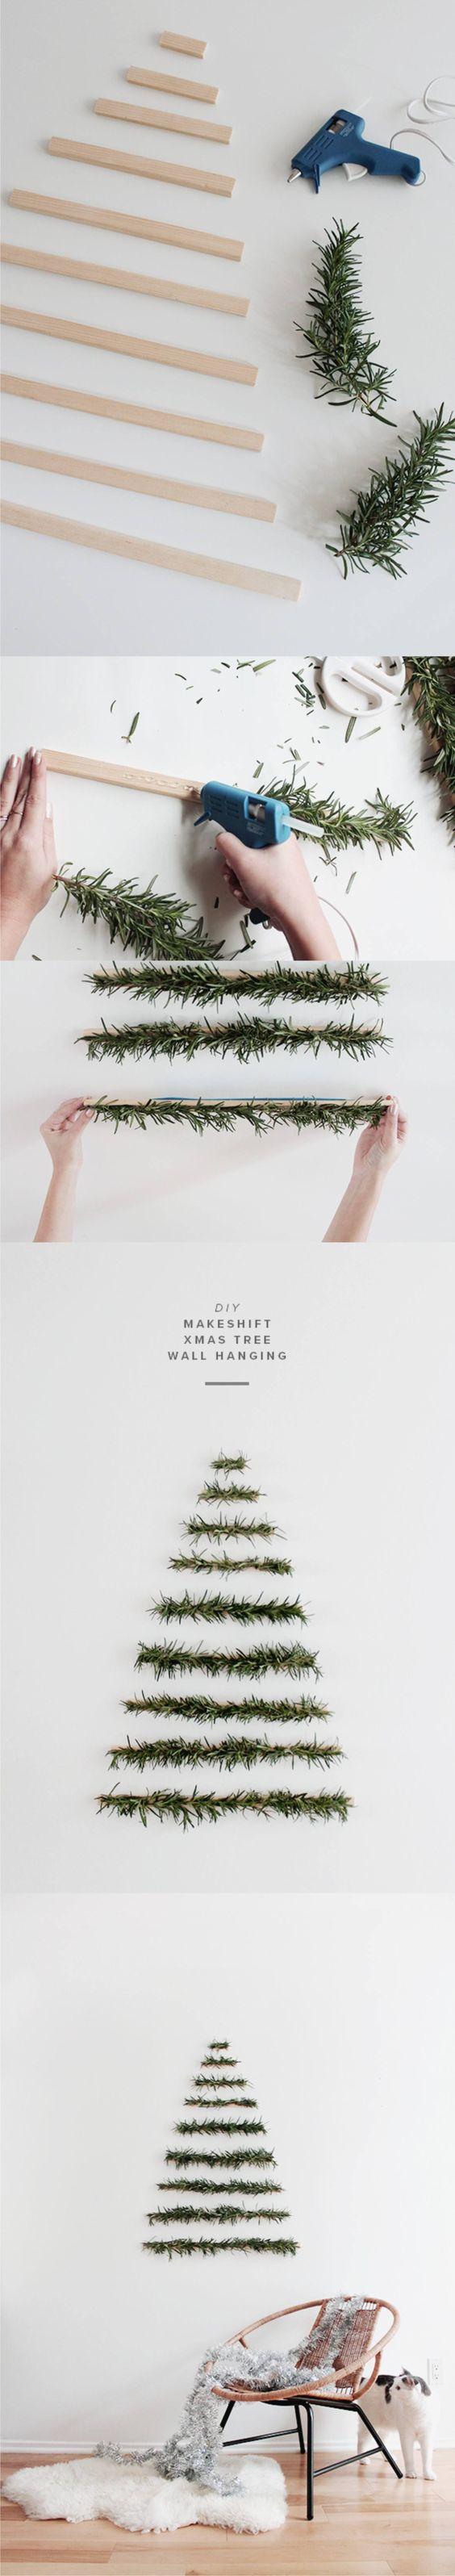 Manualidades navidad - arbol navideño para la pared